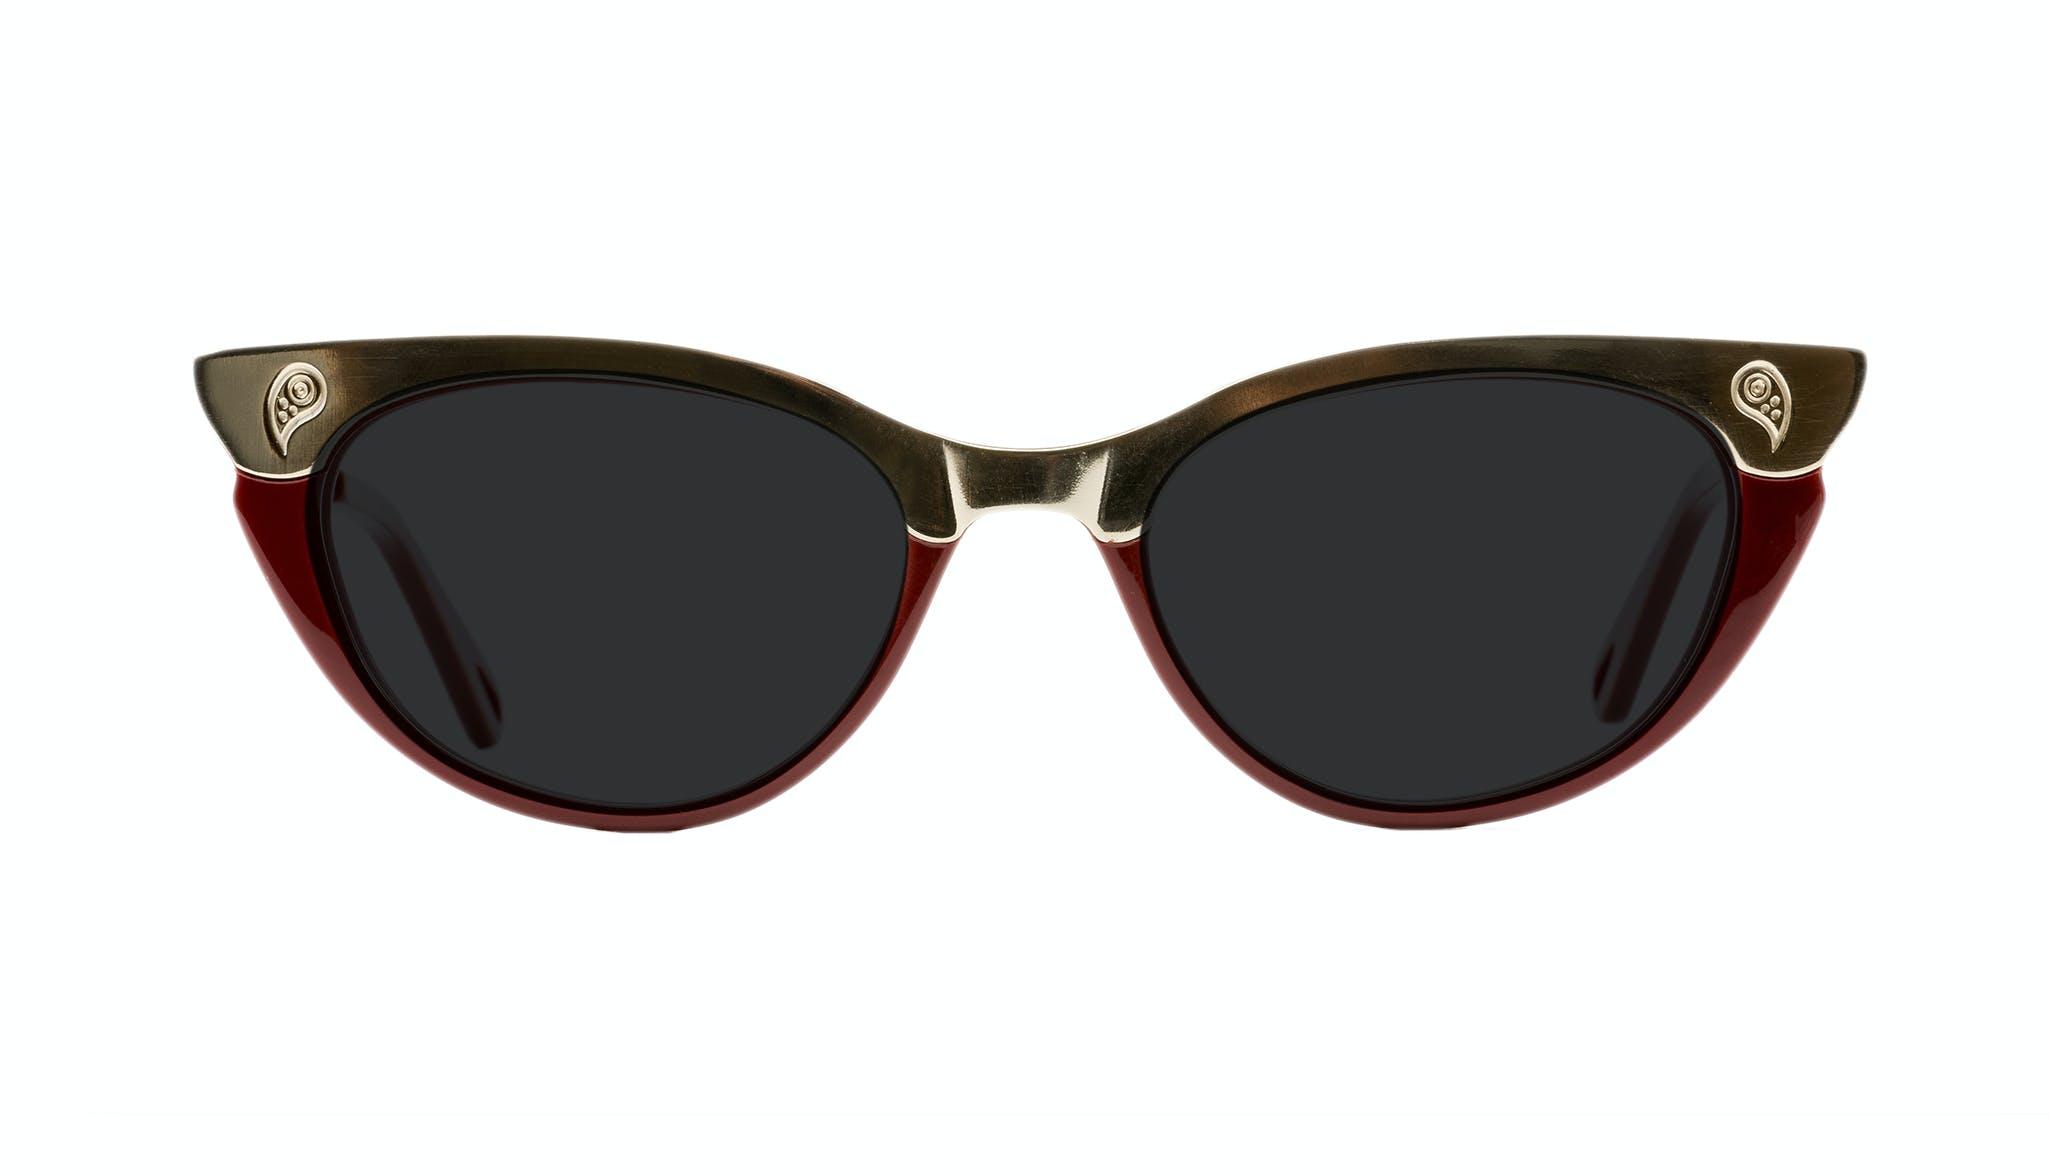 Affordable Fashion Glasses Cat Eye Daring Cateye Sunglasses Women Bad Beti Paro Front